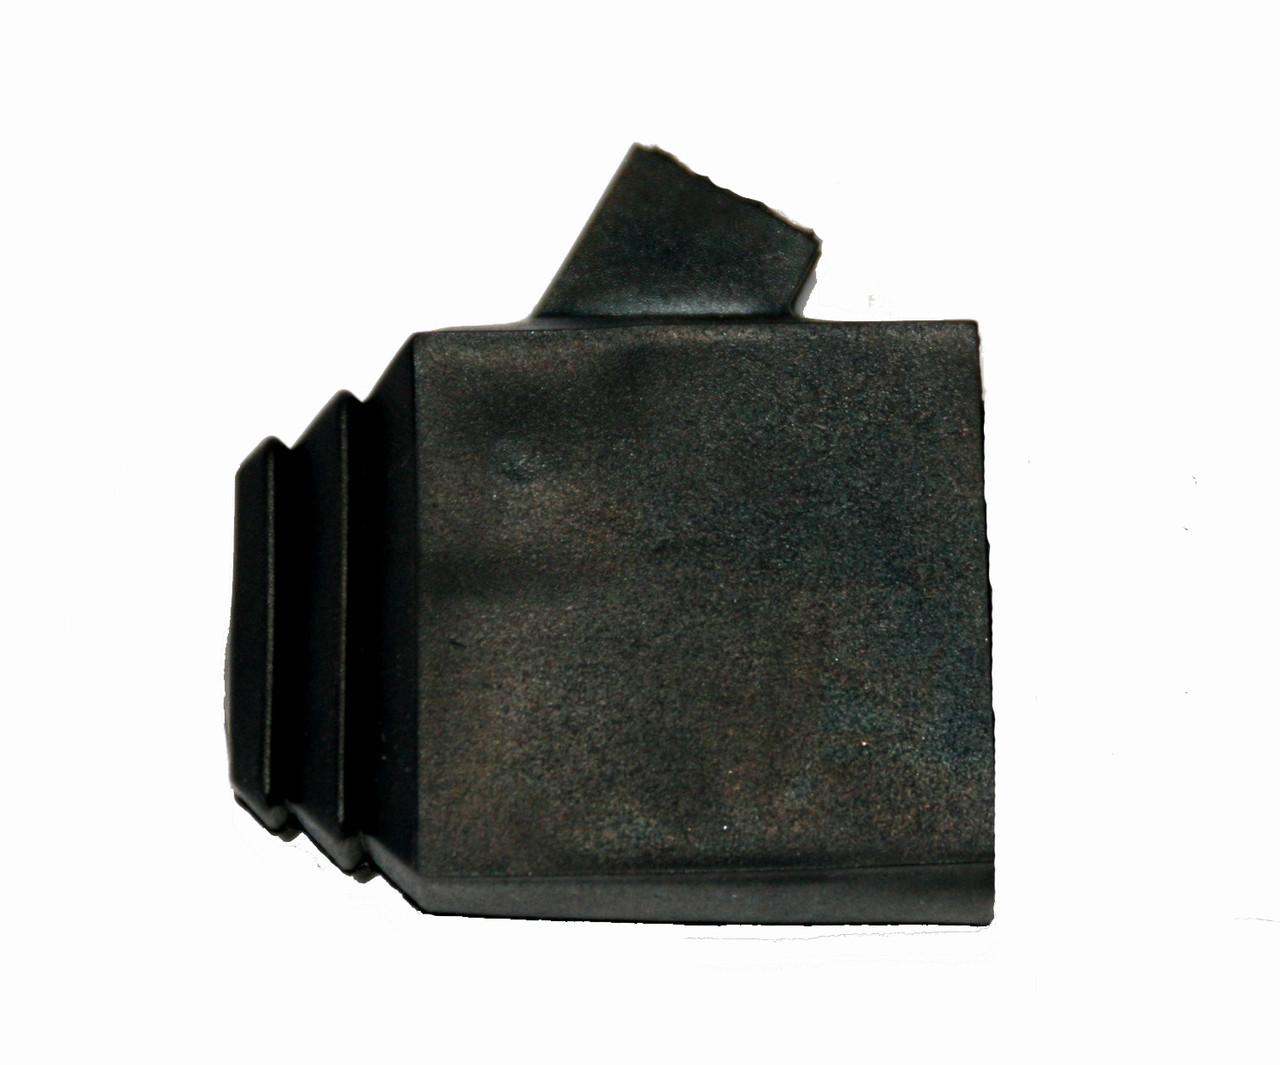 #20: P/N VLS3410: Sapphire Cadet Master Cylinder Dust Cover